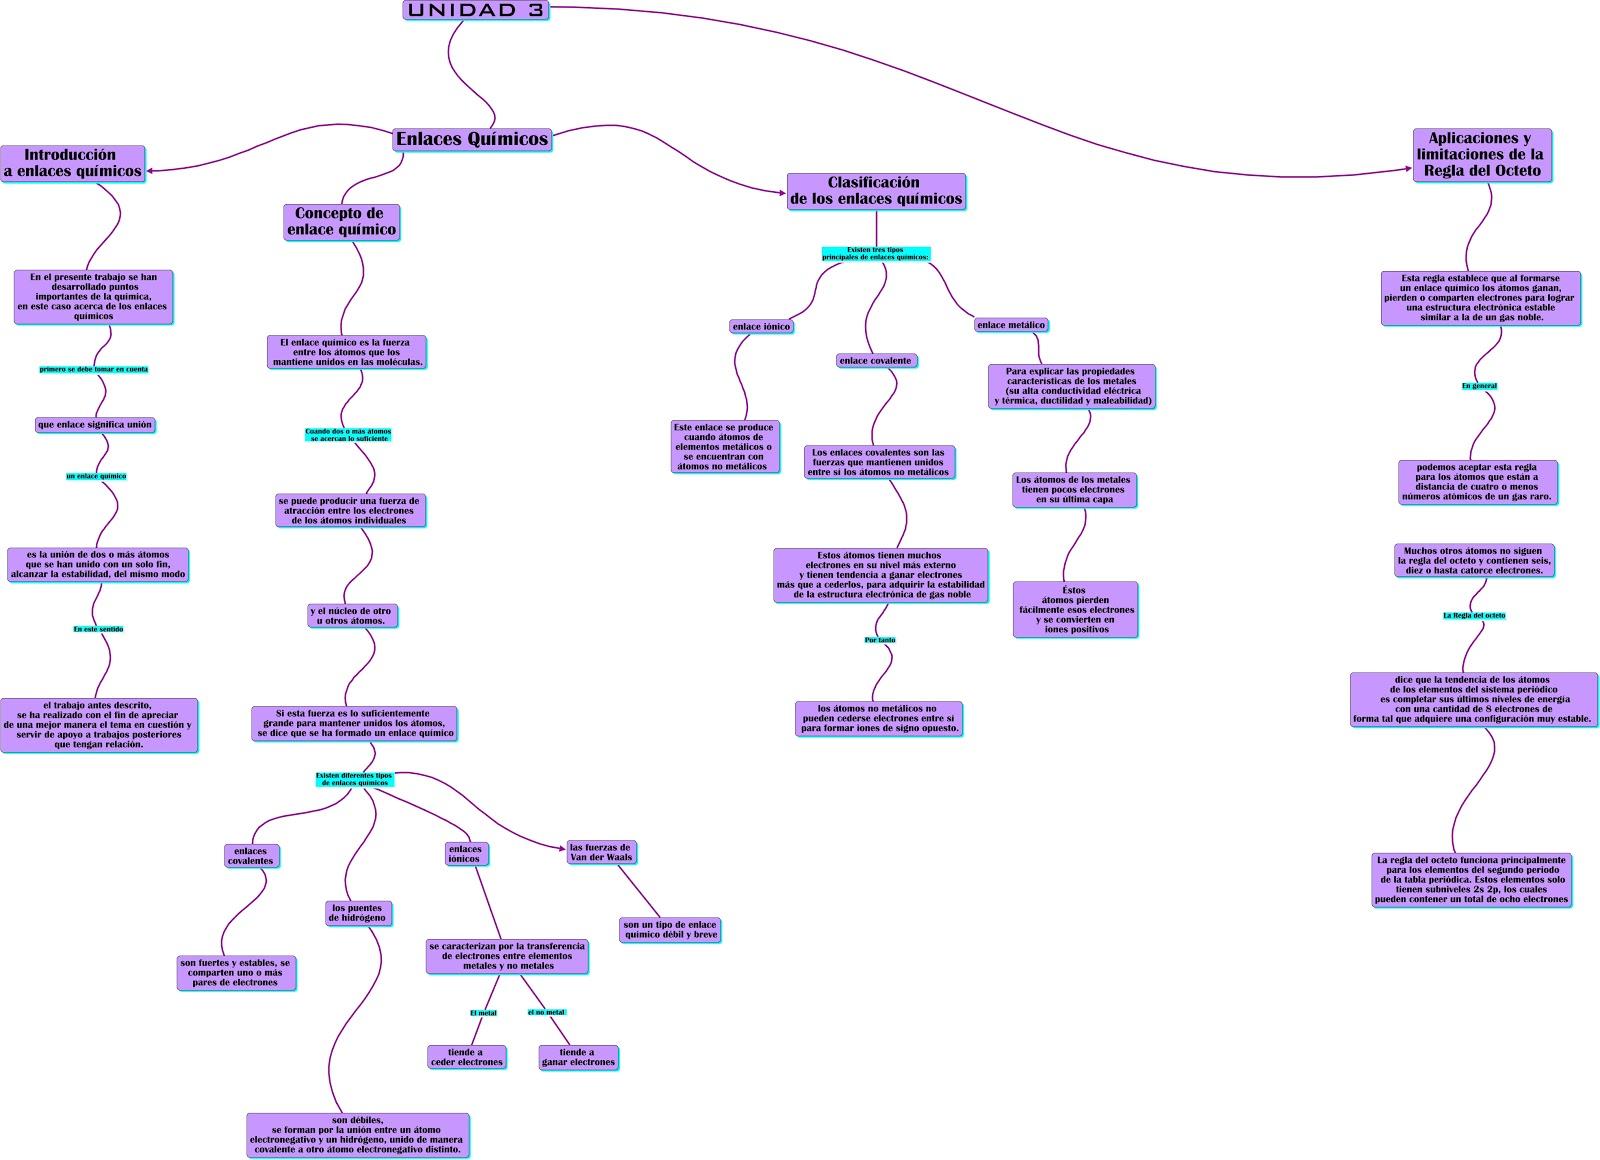 Quimica i mapa conceptual n6 unidad 3 enlaces quimicos de miriam mapa conceptual n6 unidad 3 enlaces quimicos de miriam lizbeth valdes alpires urtaz Gallery